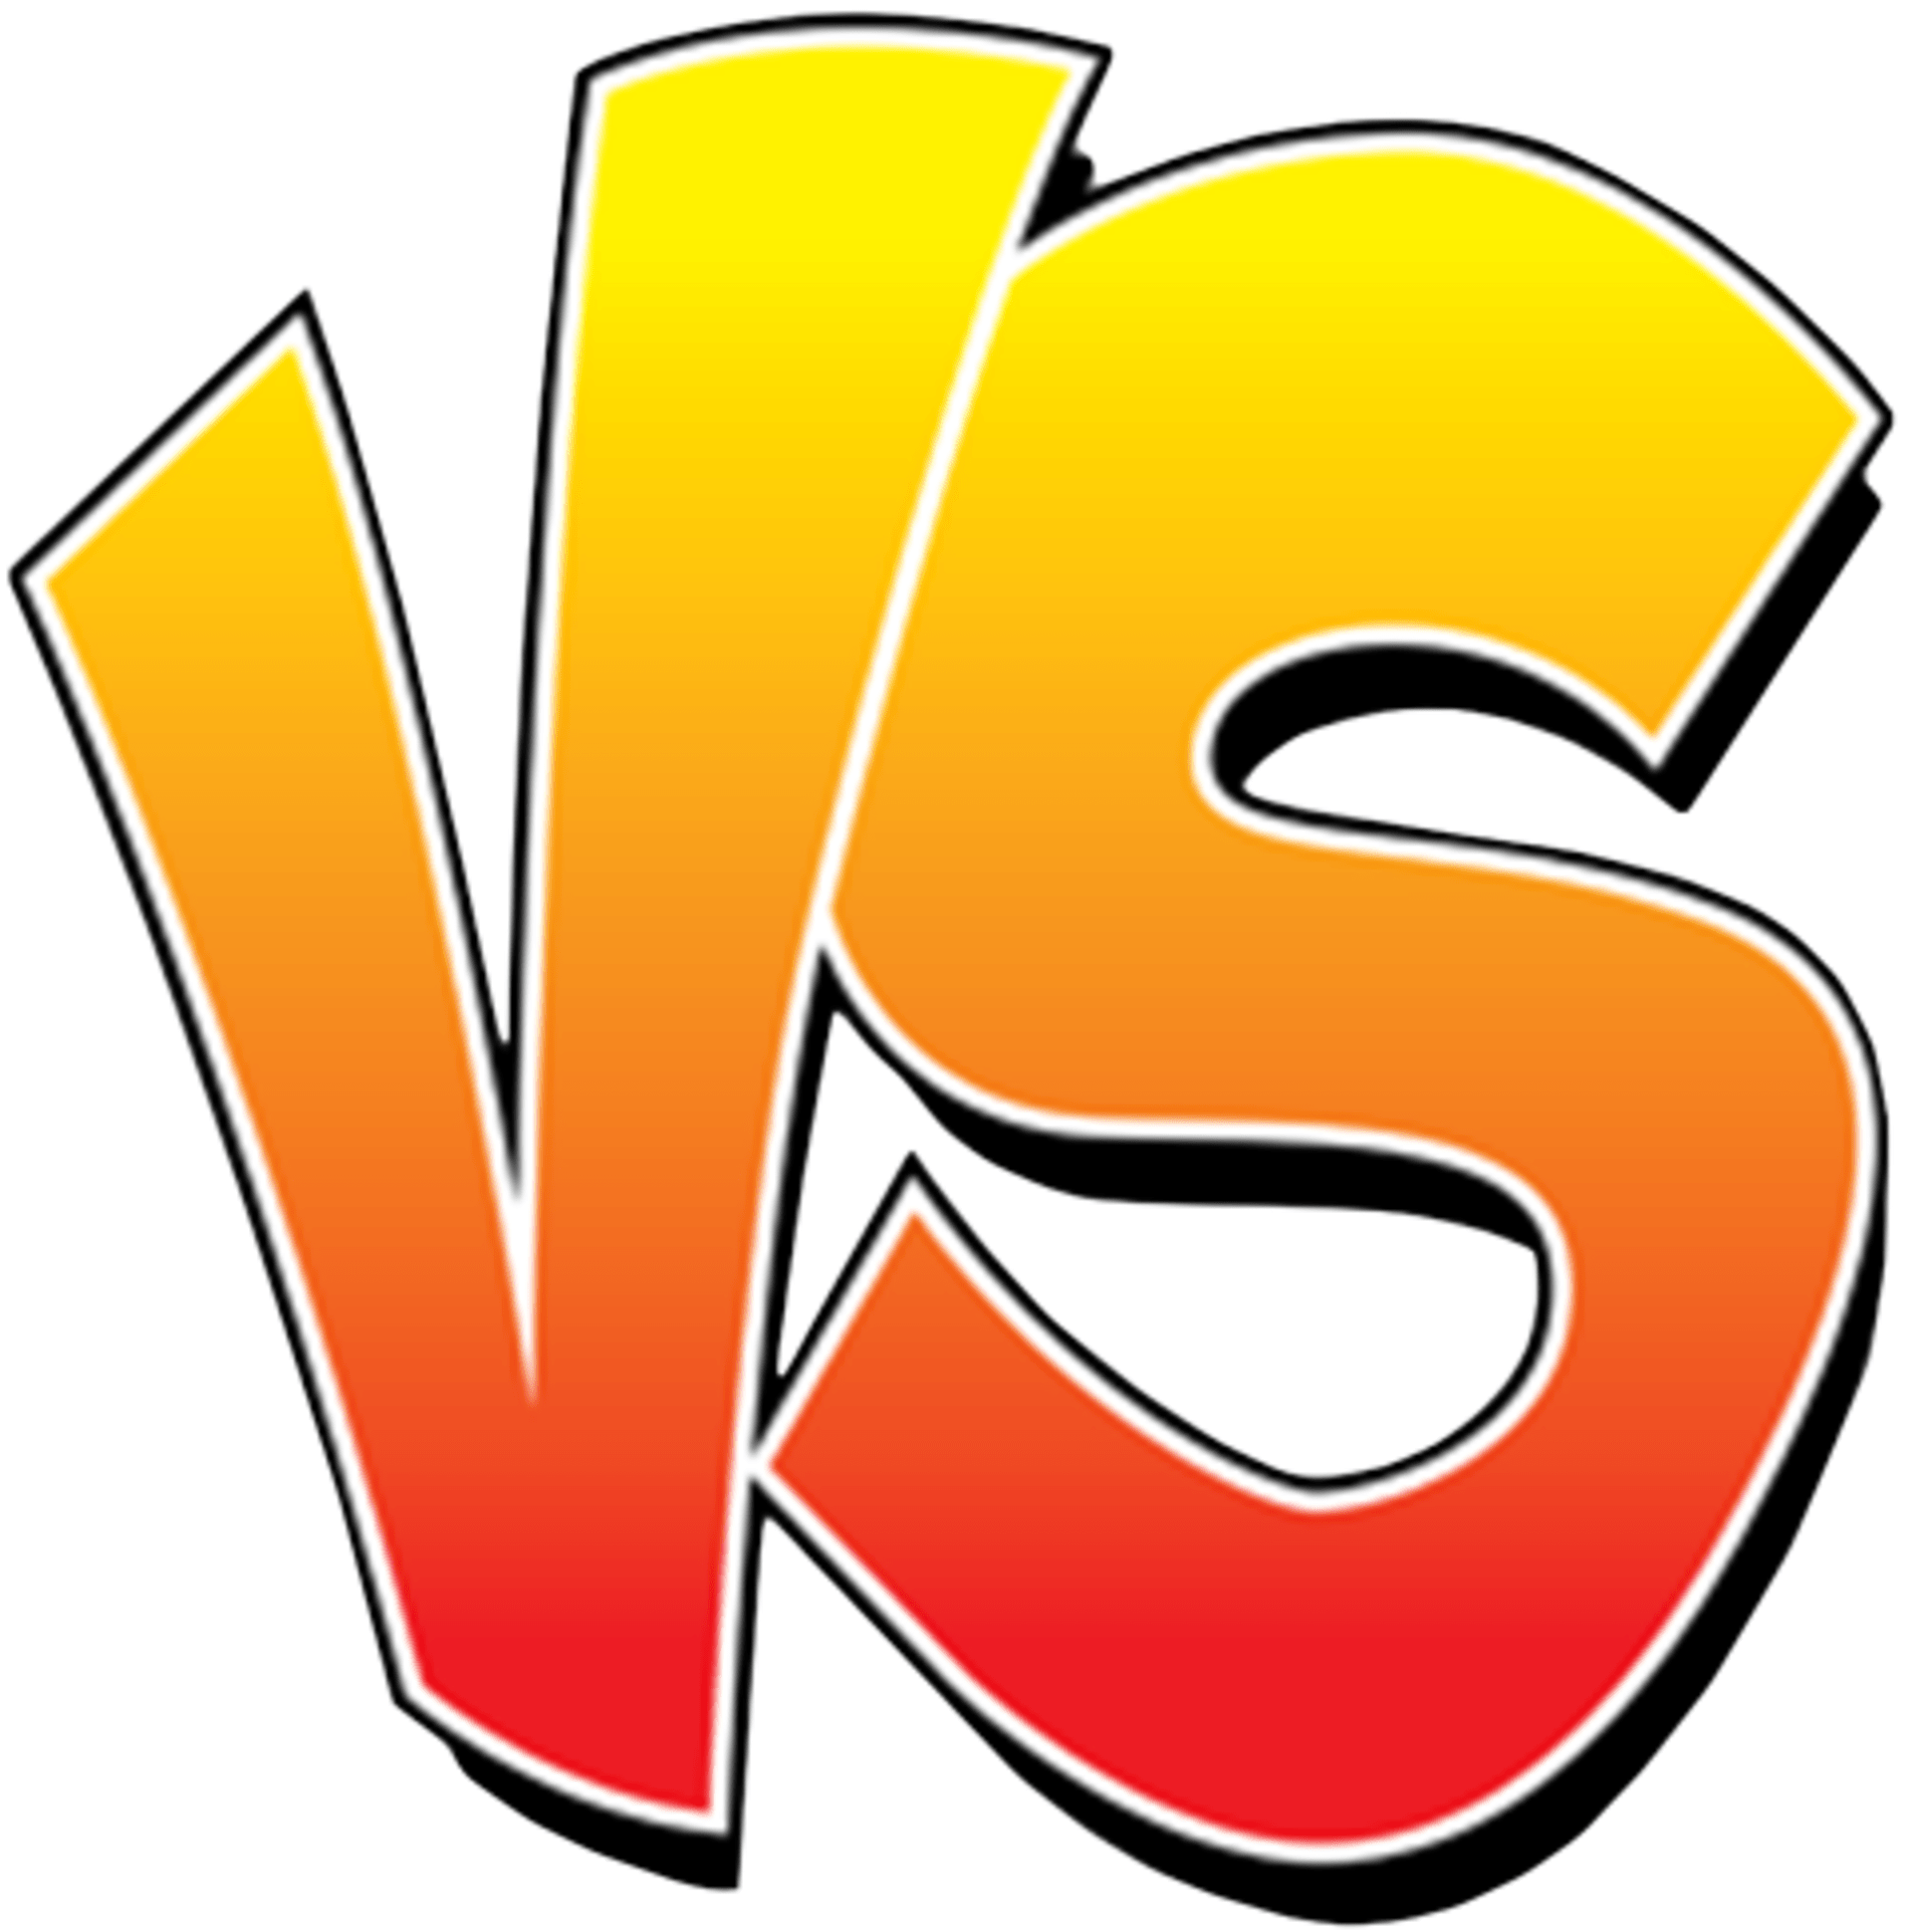 Versus Logo Png, Transparent PNG, png collections at dlf.pt